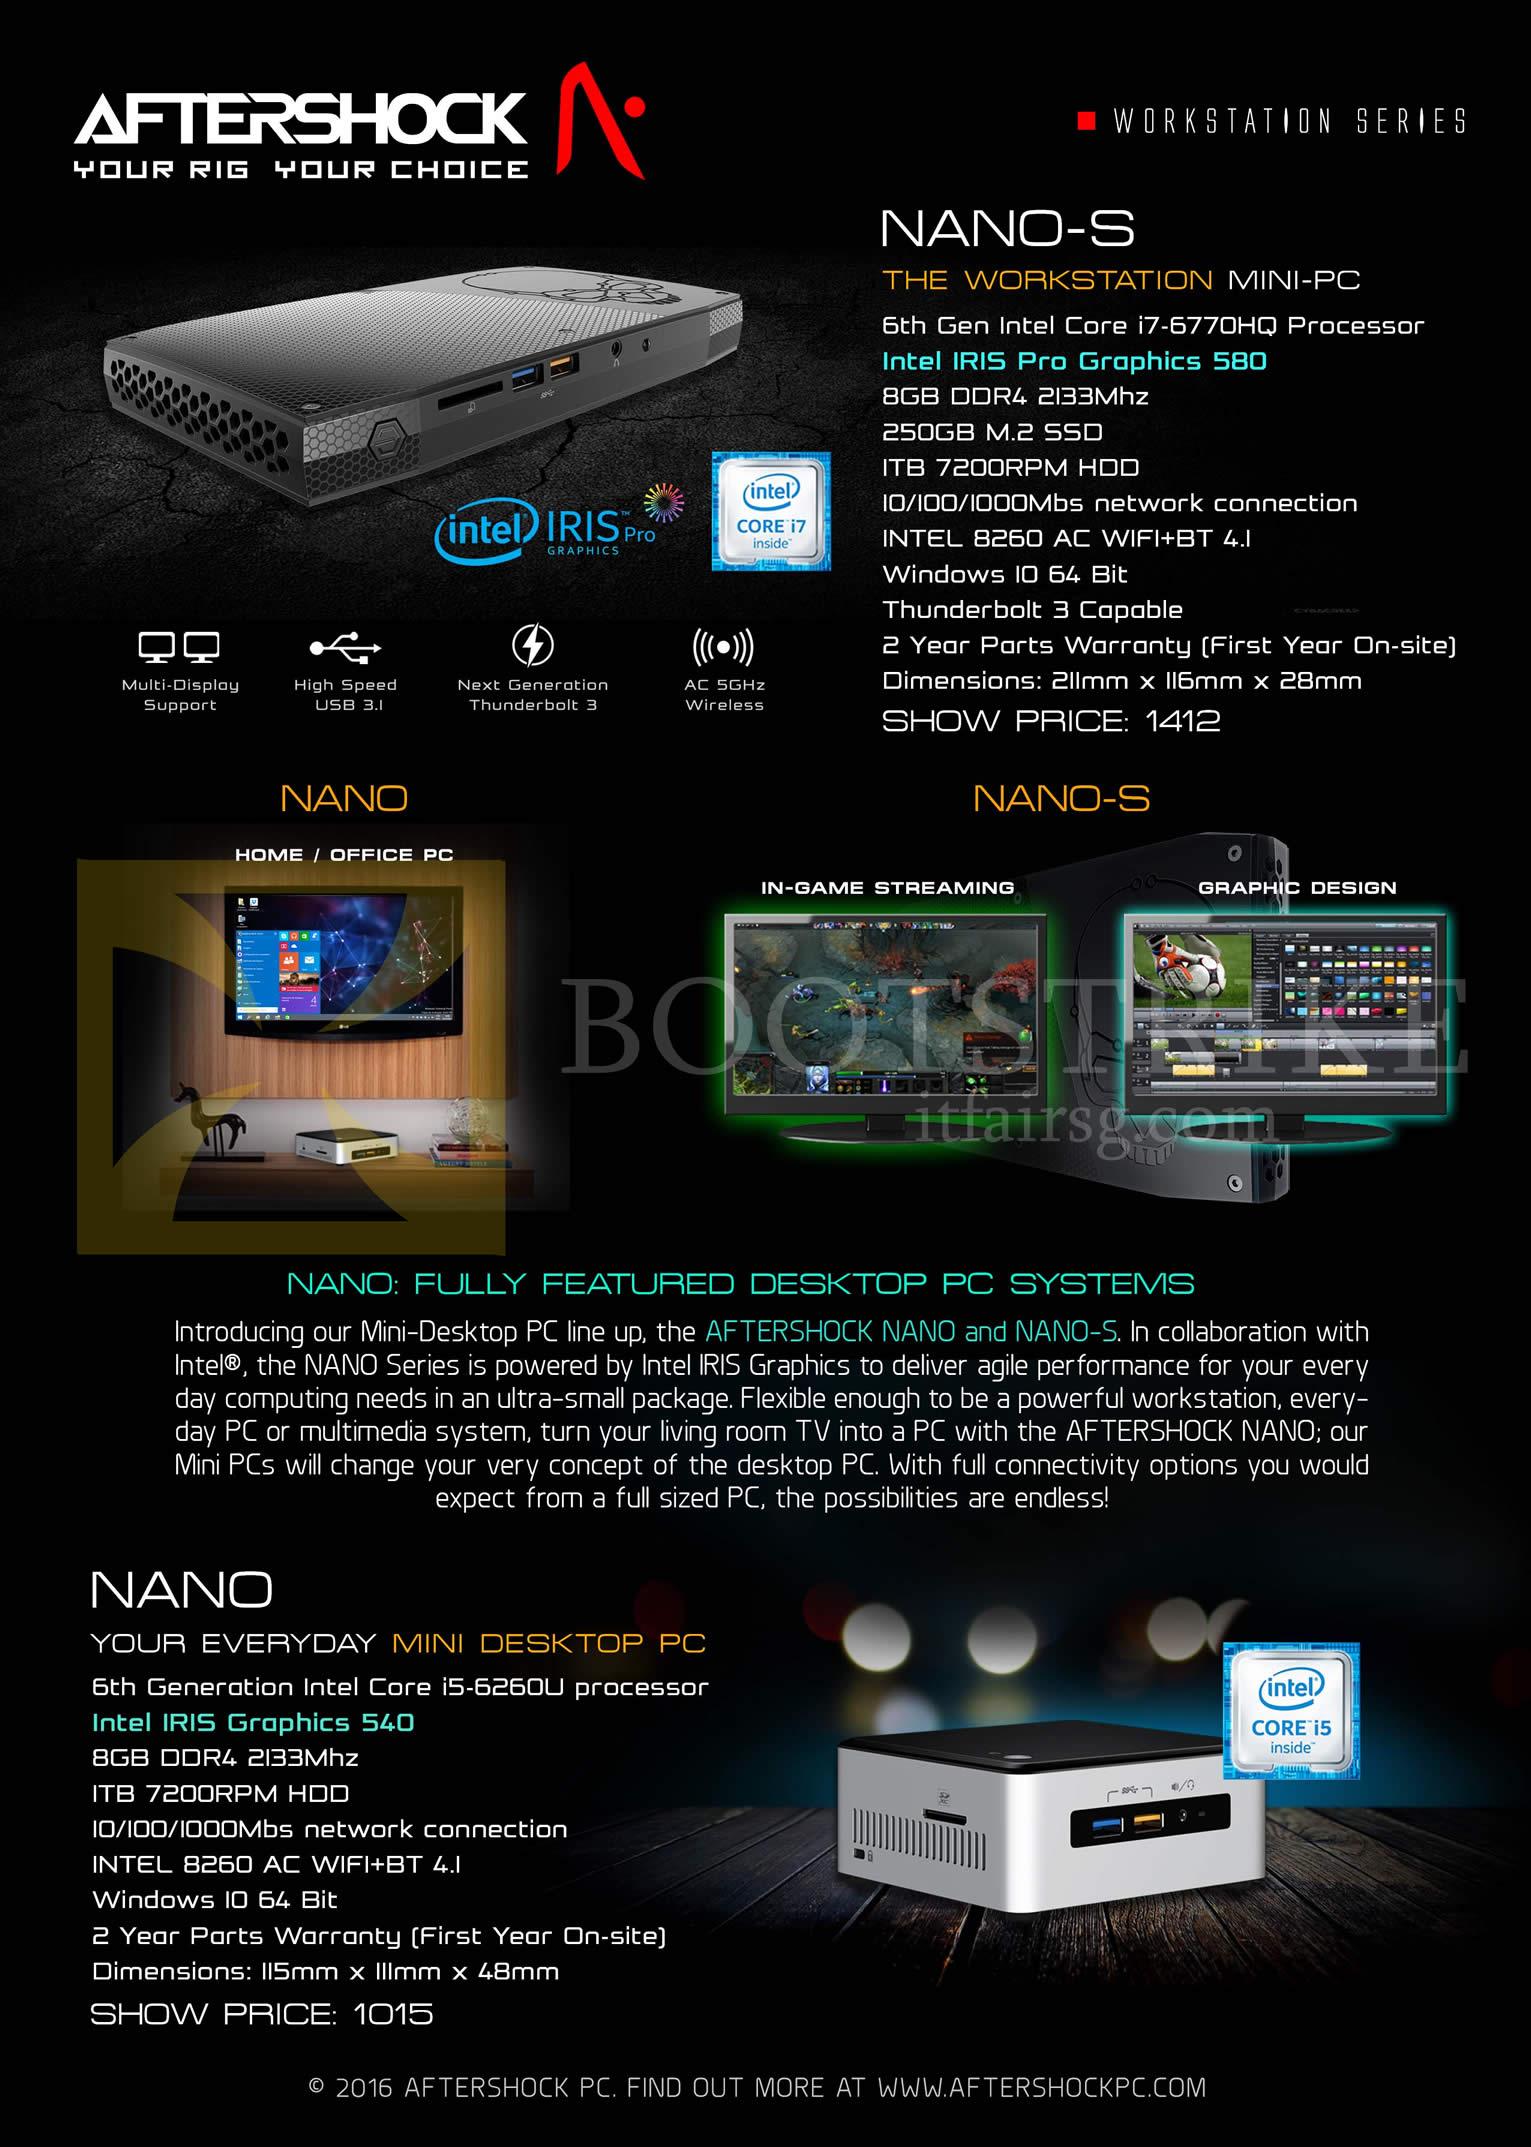 PC SHOW 2016 price list image brochure of Aftershock Desktop PCs Nano, Nano-S Workstation